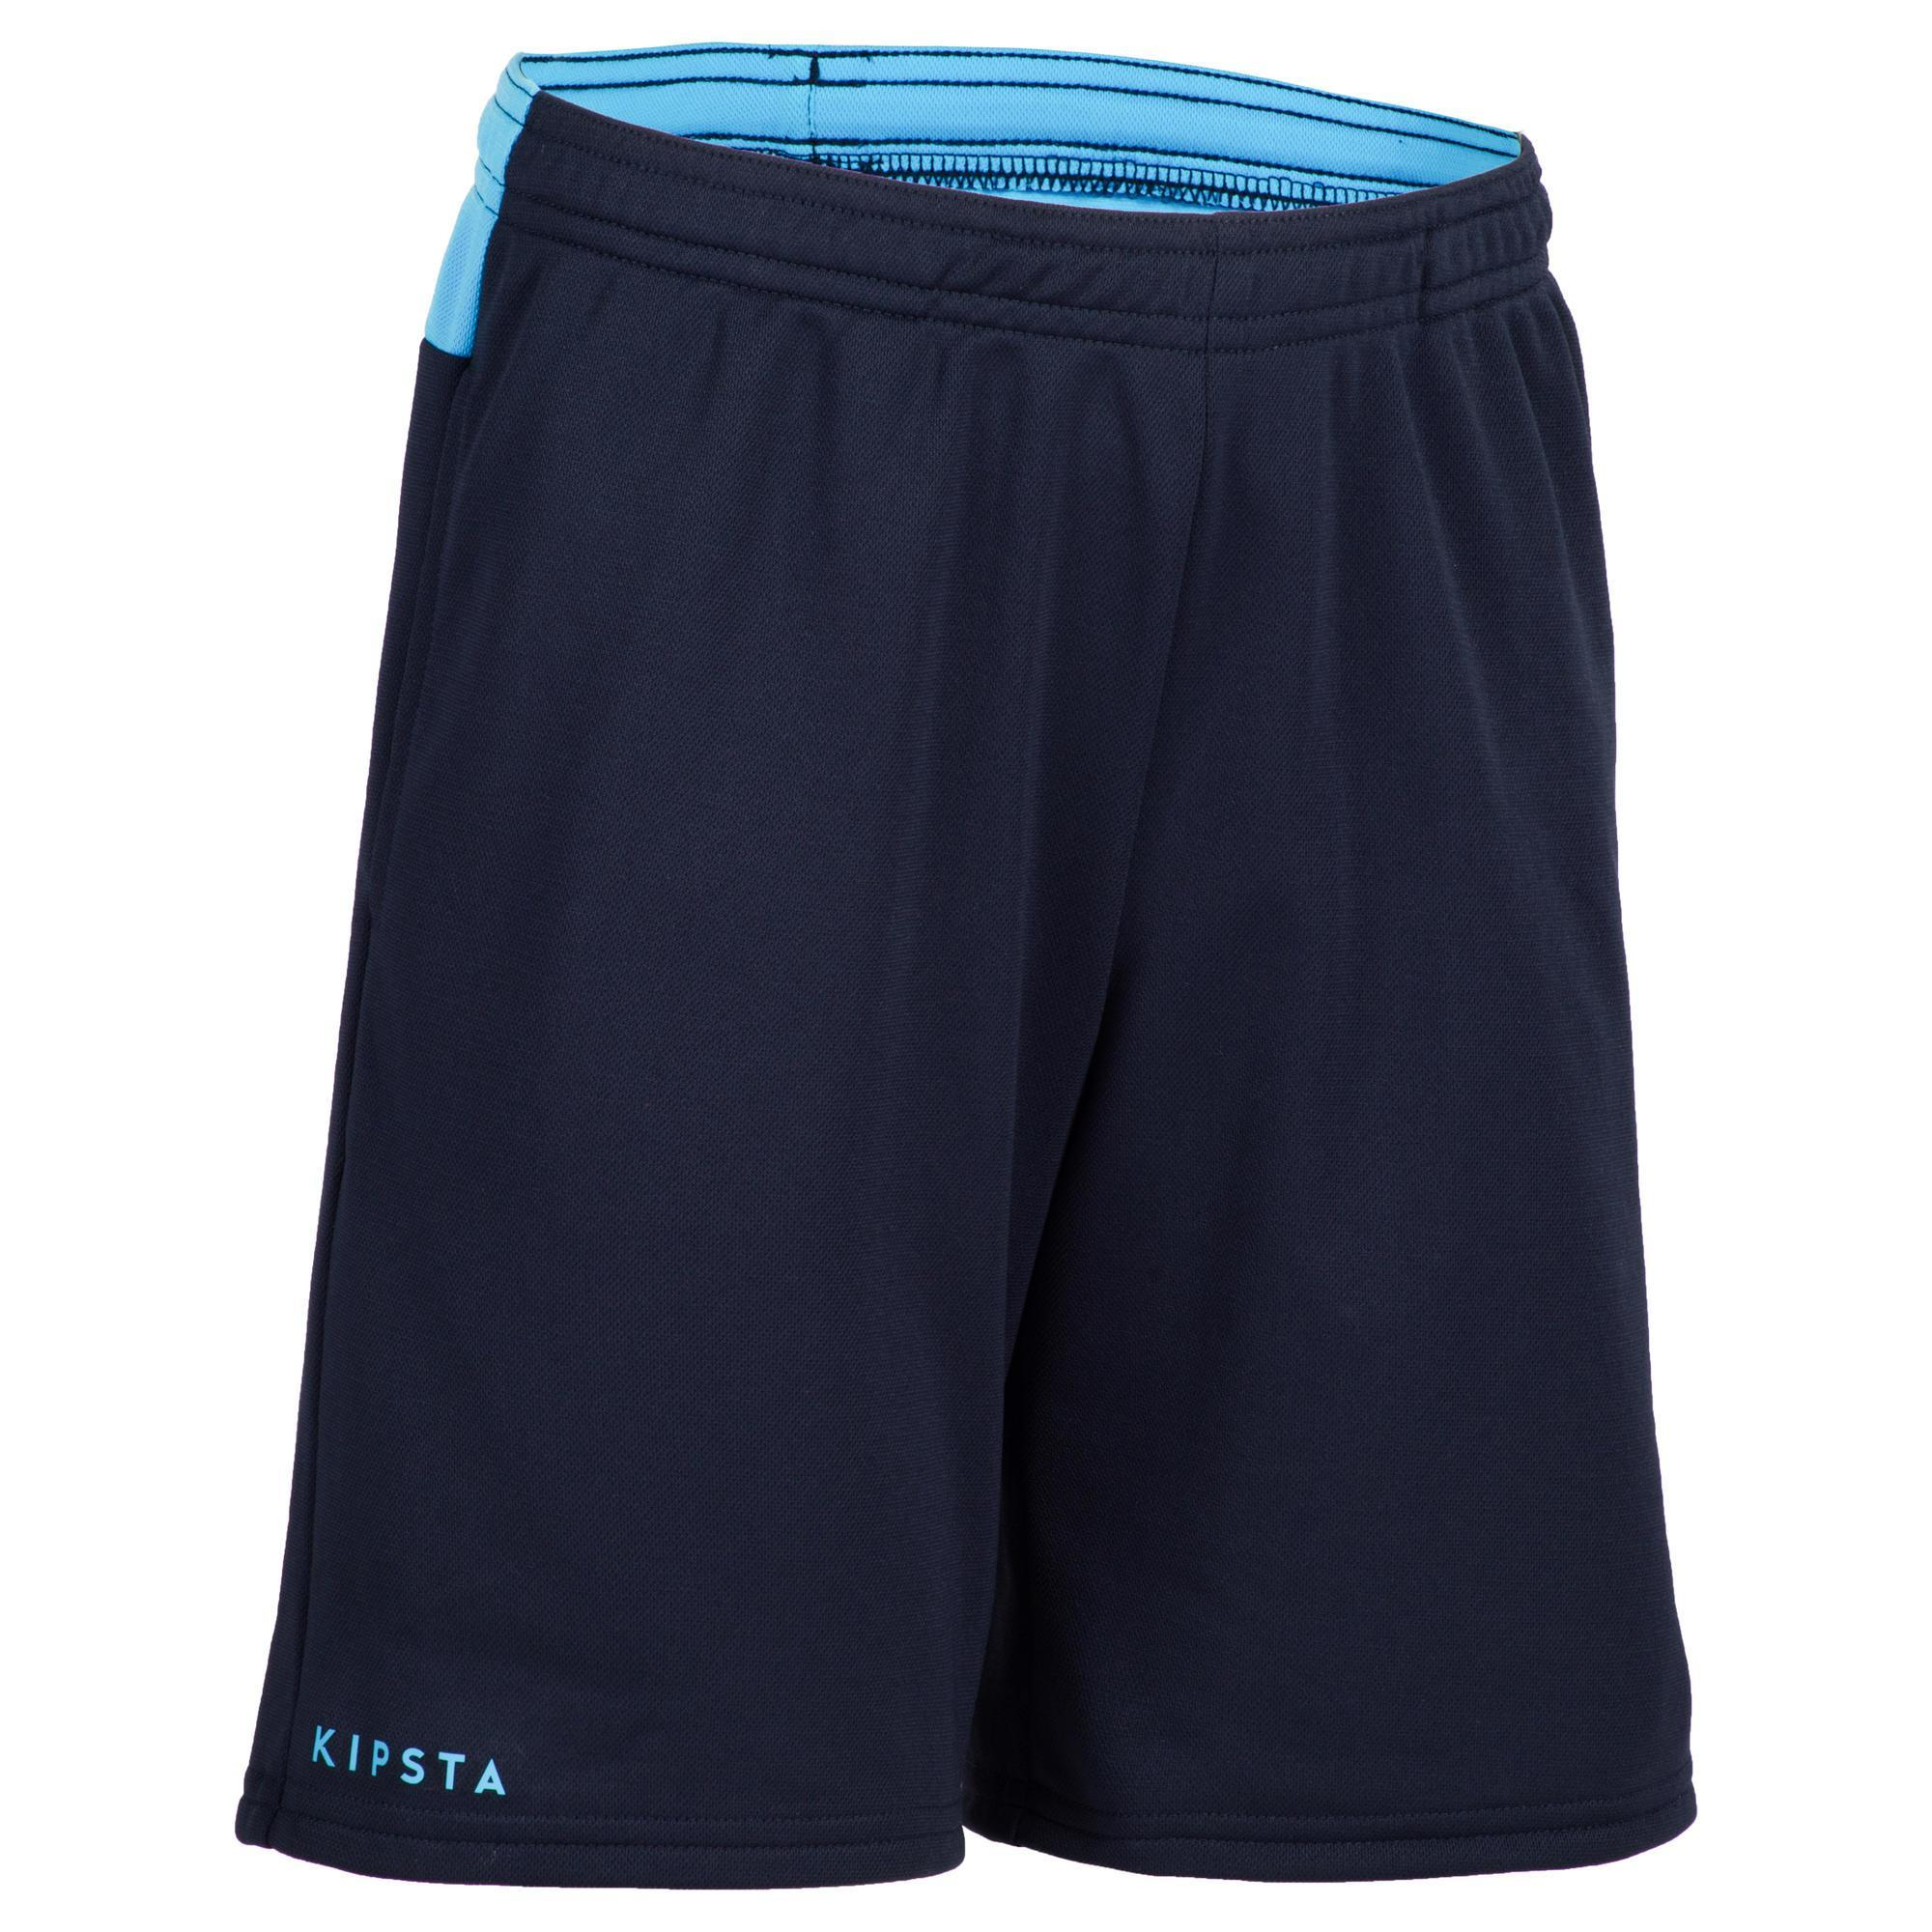 Kipsta Jongensshort voor veldhockey FH100 marineblauw/lichtblauw